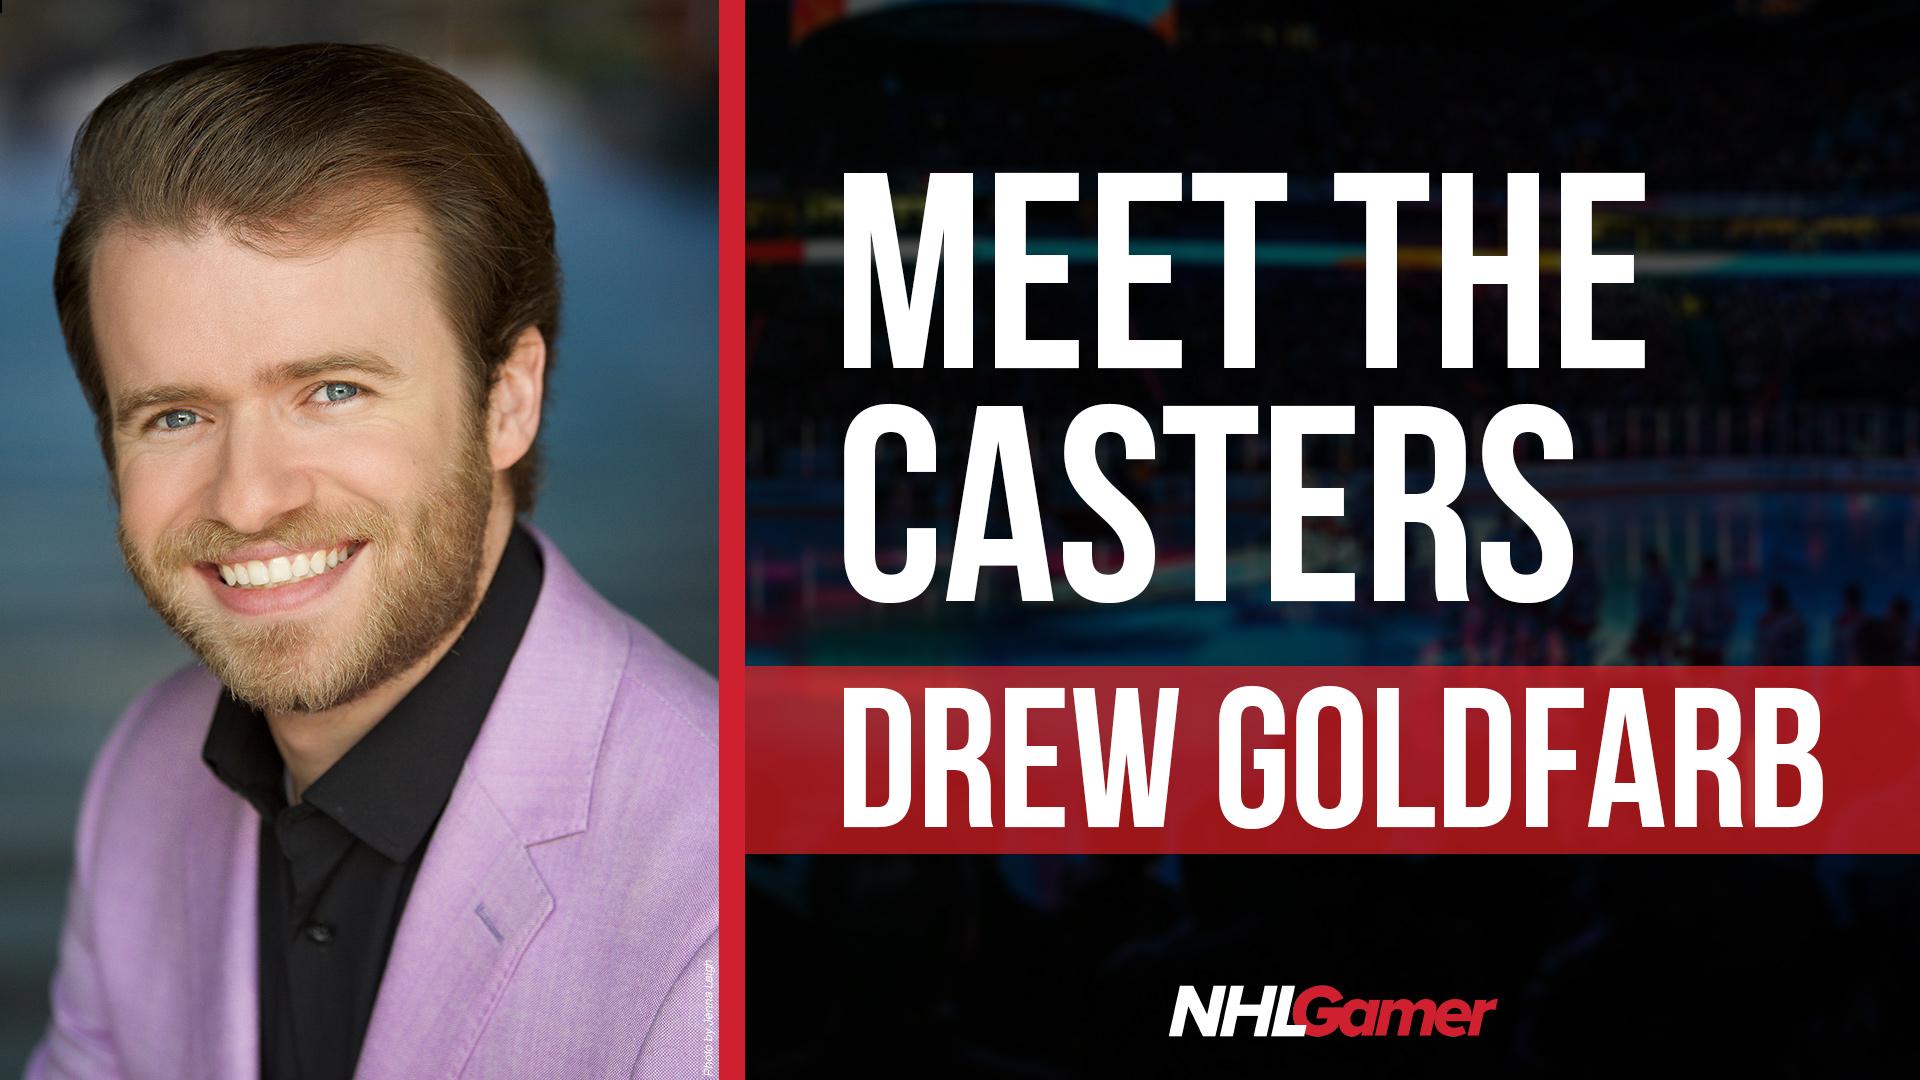 Meet_the_Casters_Drew.jpg